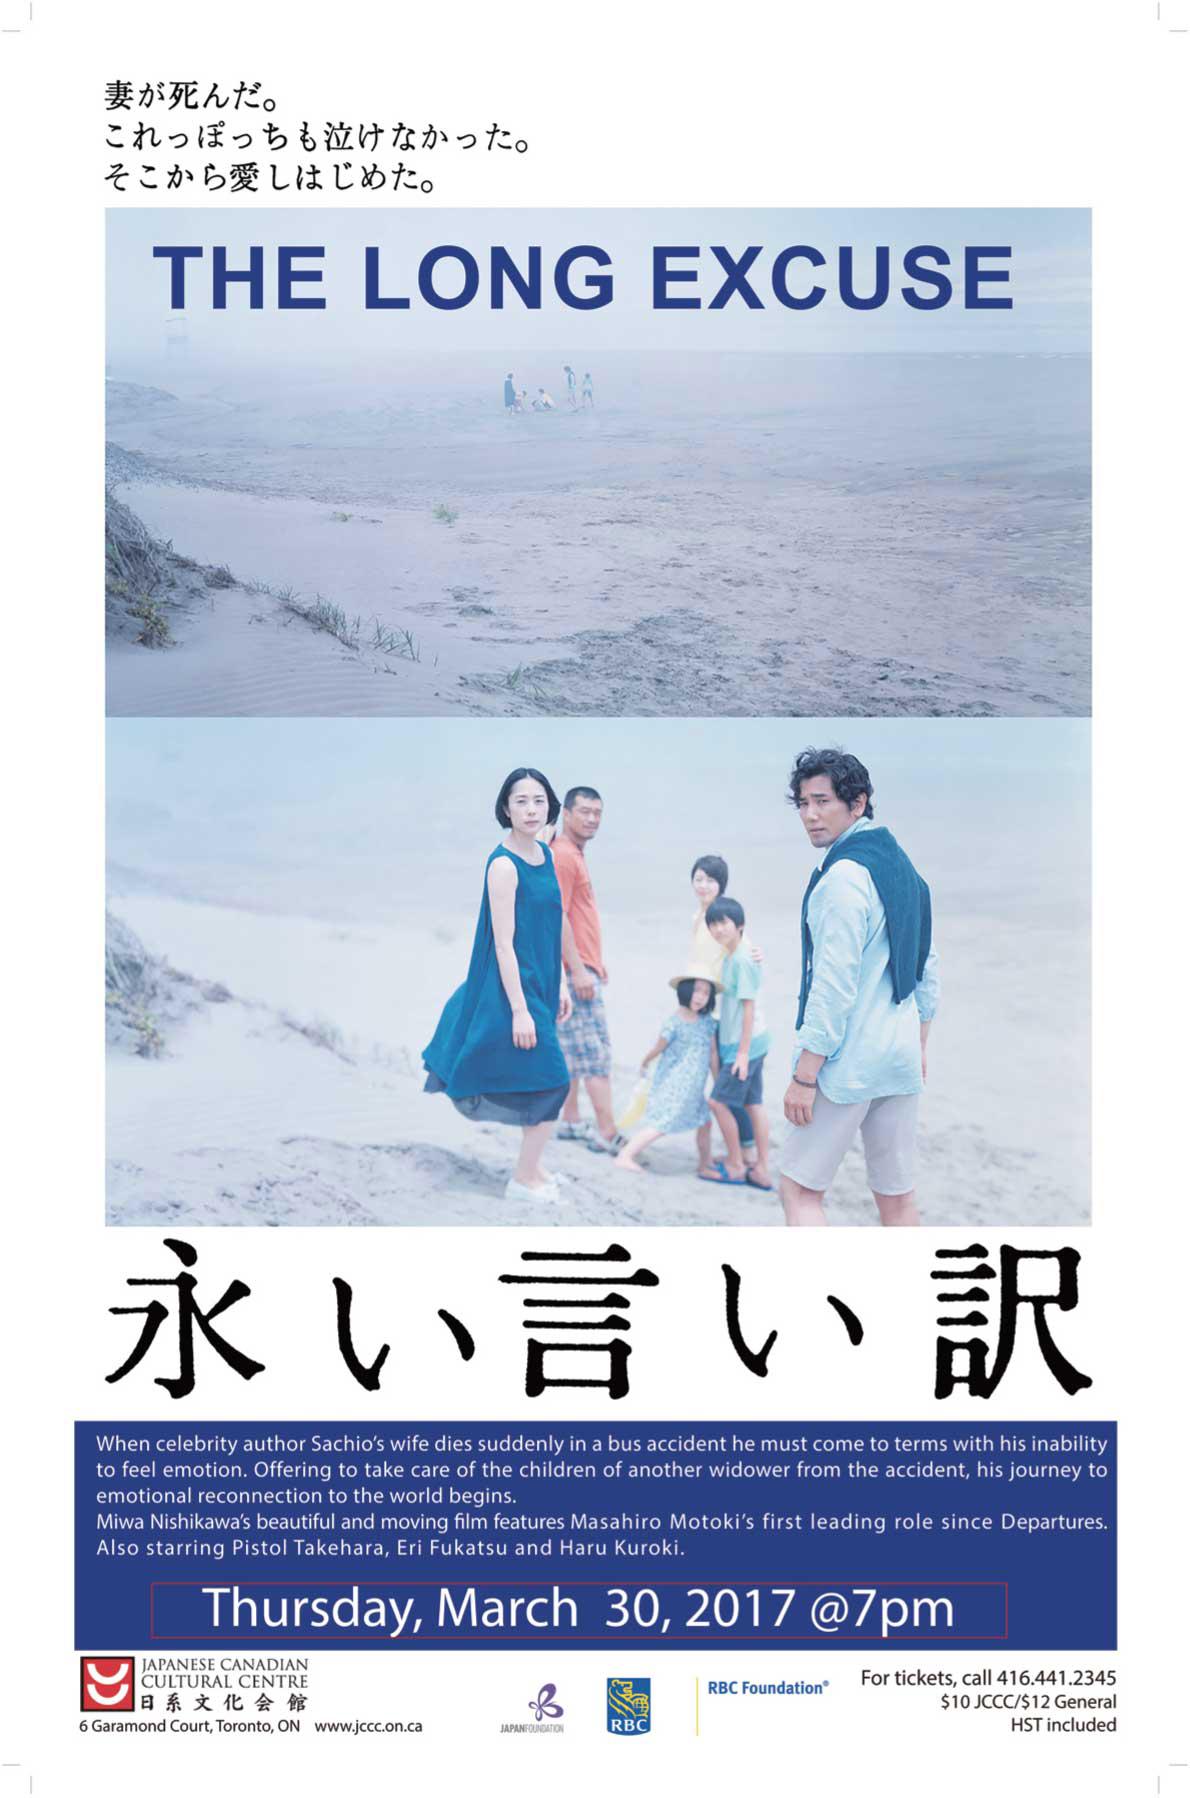 jccc-nagai-iiwake